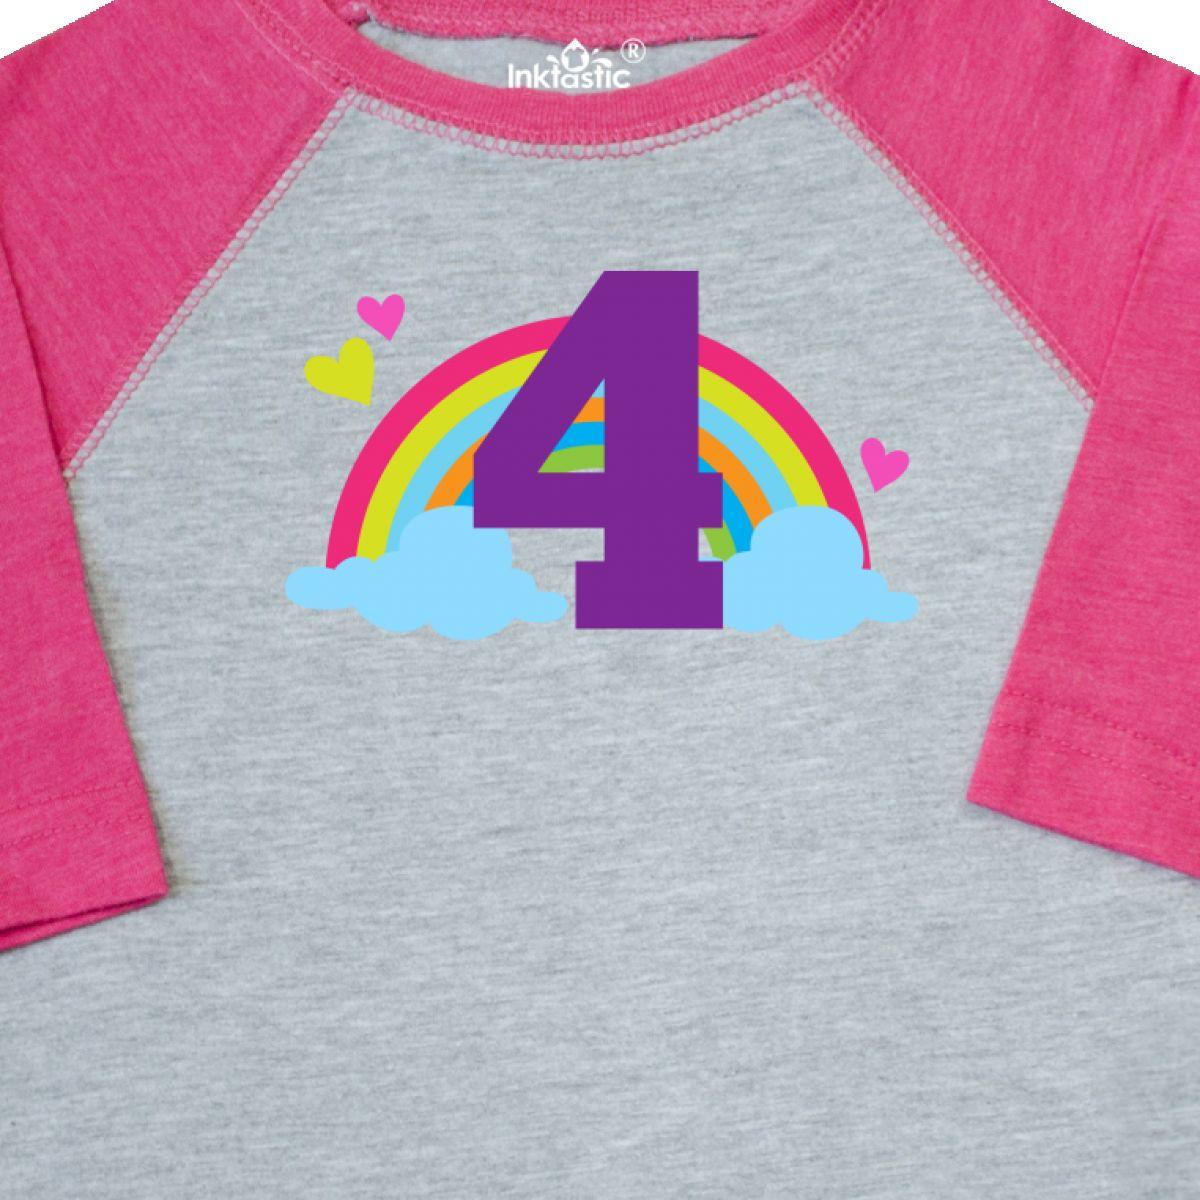 Inktastic-4th-Birthday-Rainbow-Toddler-T-Shirt-Fourth-Number-Four-Girls-Cute-Kid thumbnail 6